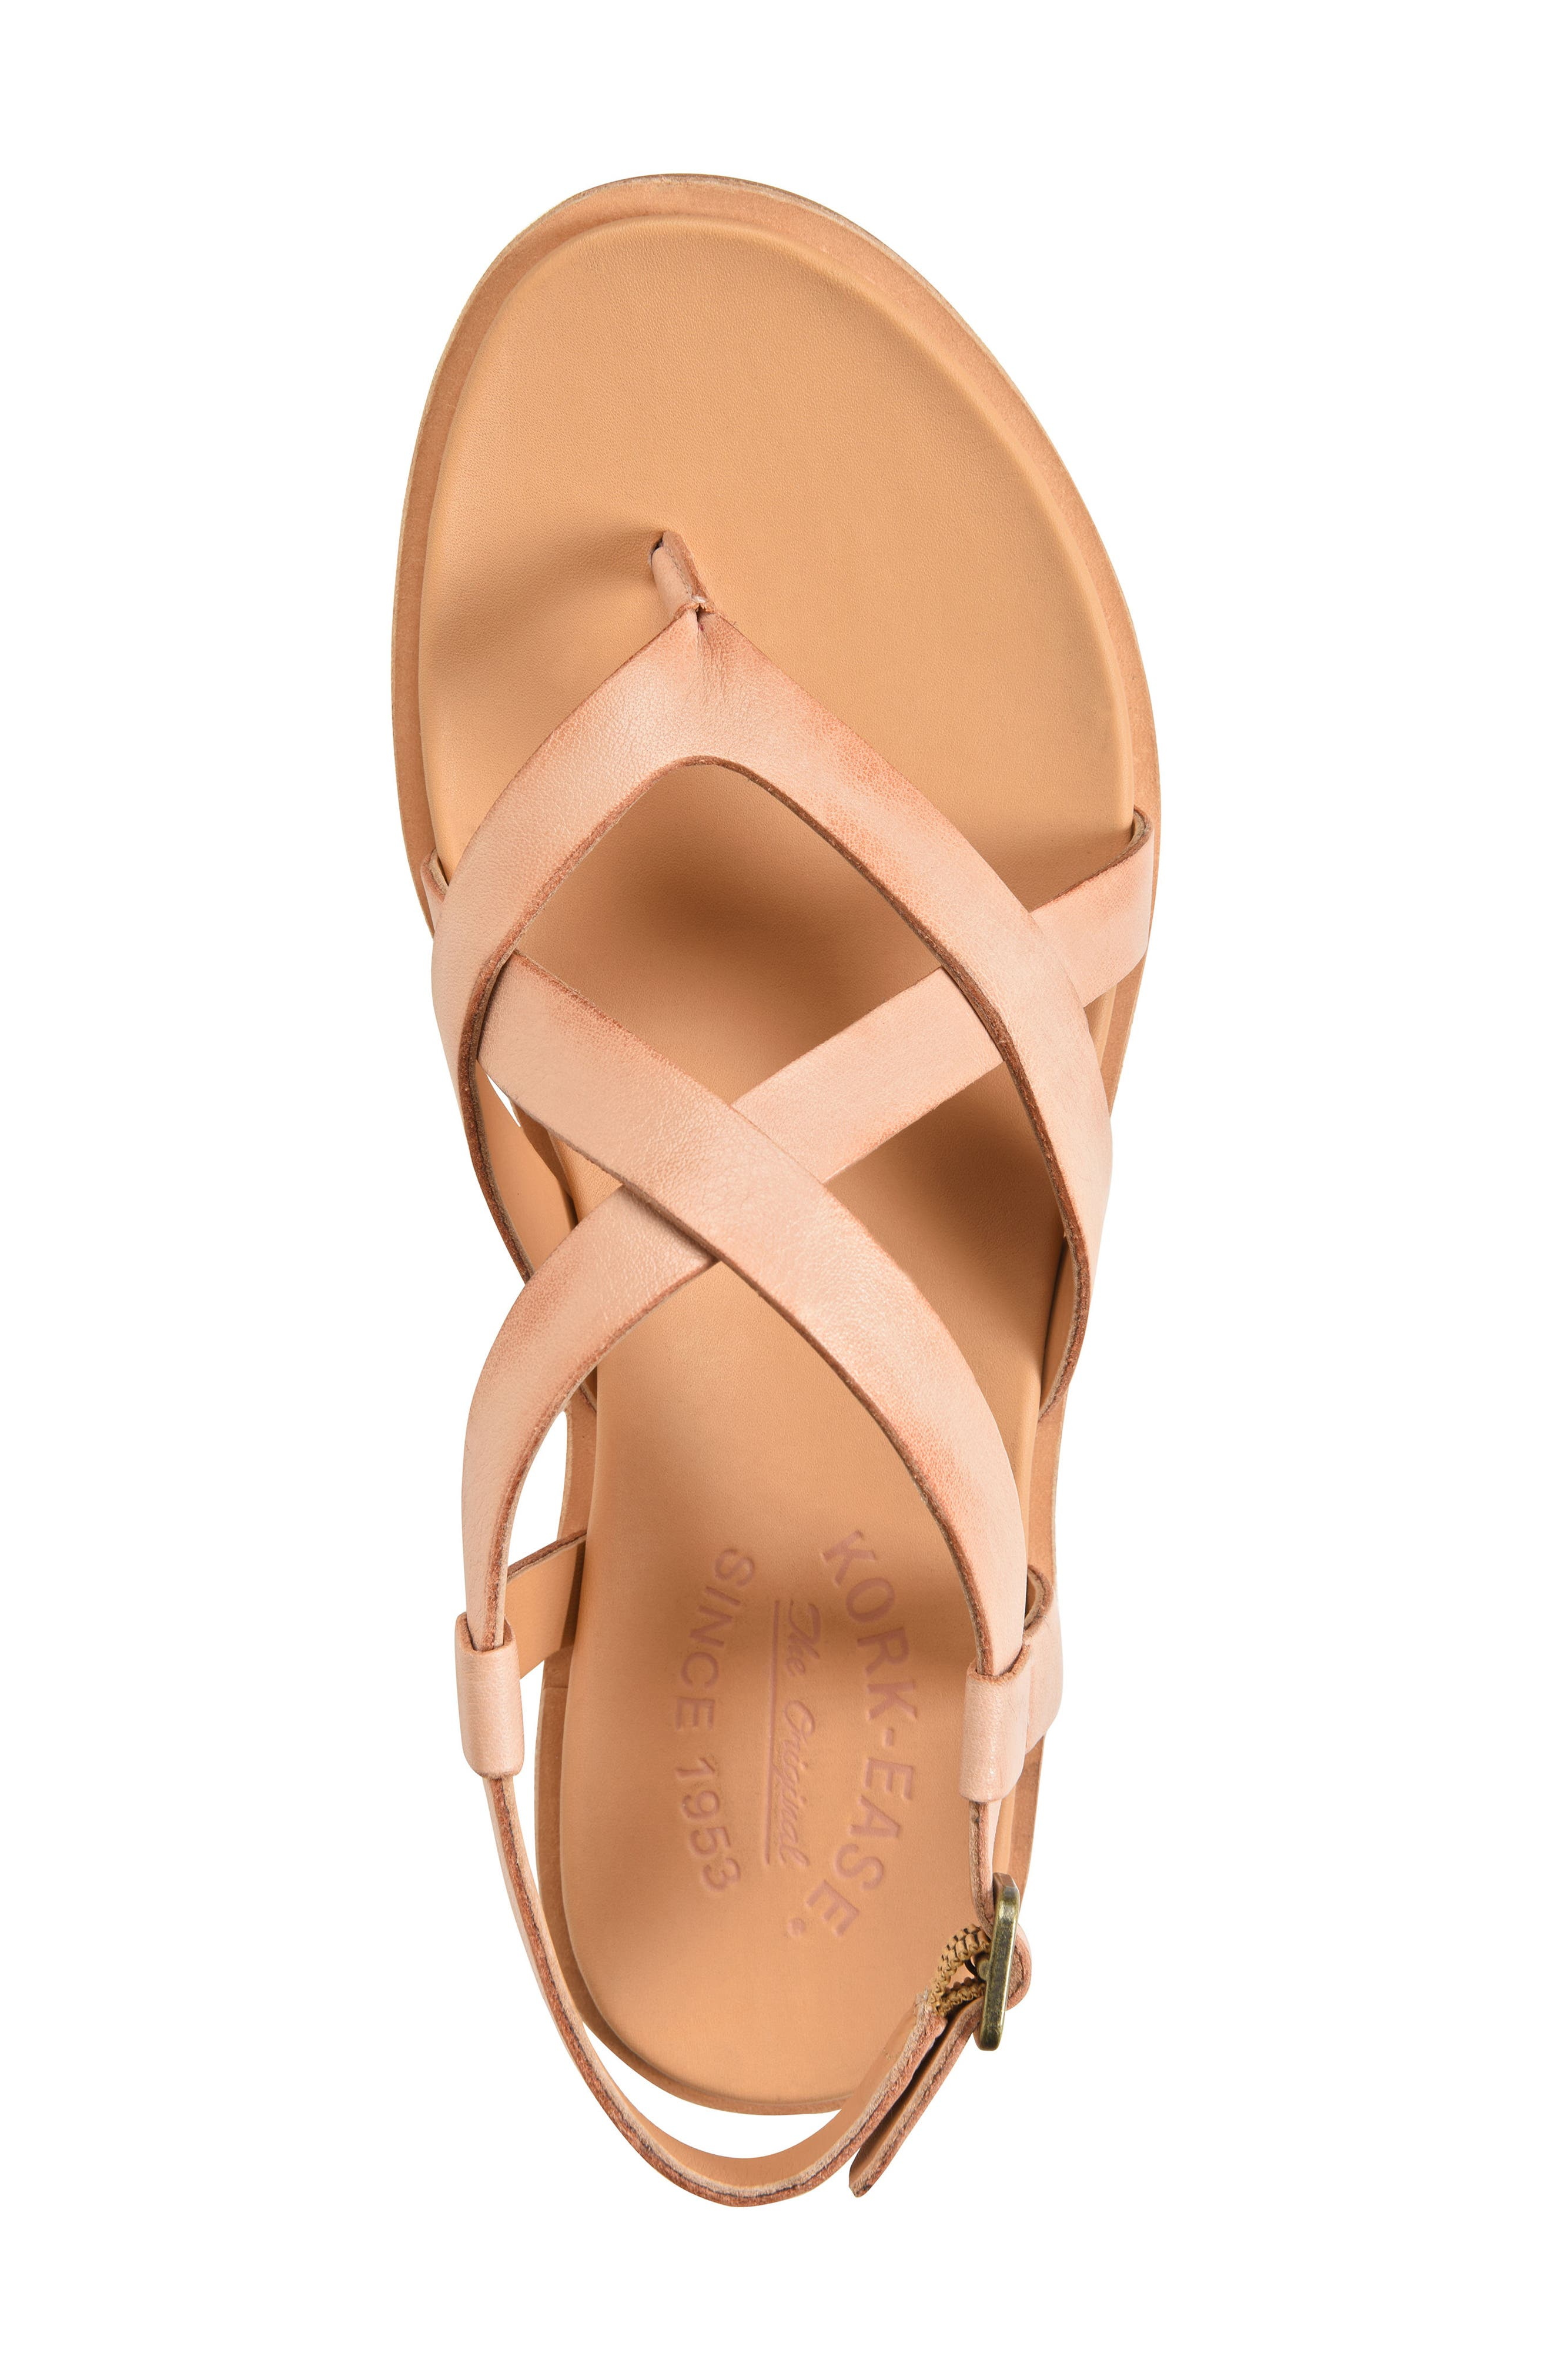 Yarbrough Sandal,                             Alternate thumbnail 5, color,                             Blush Leather